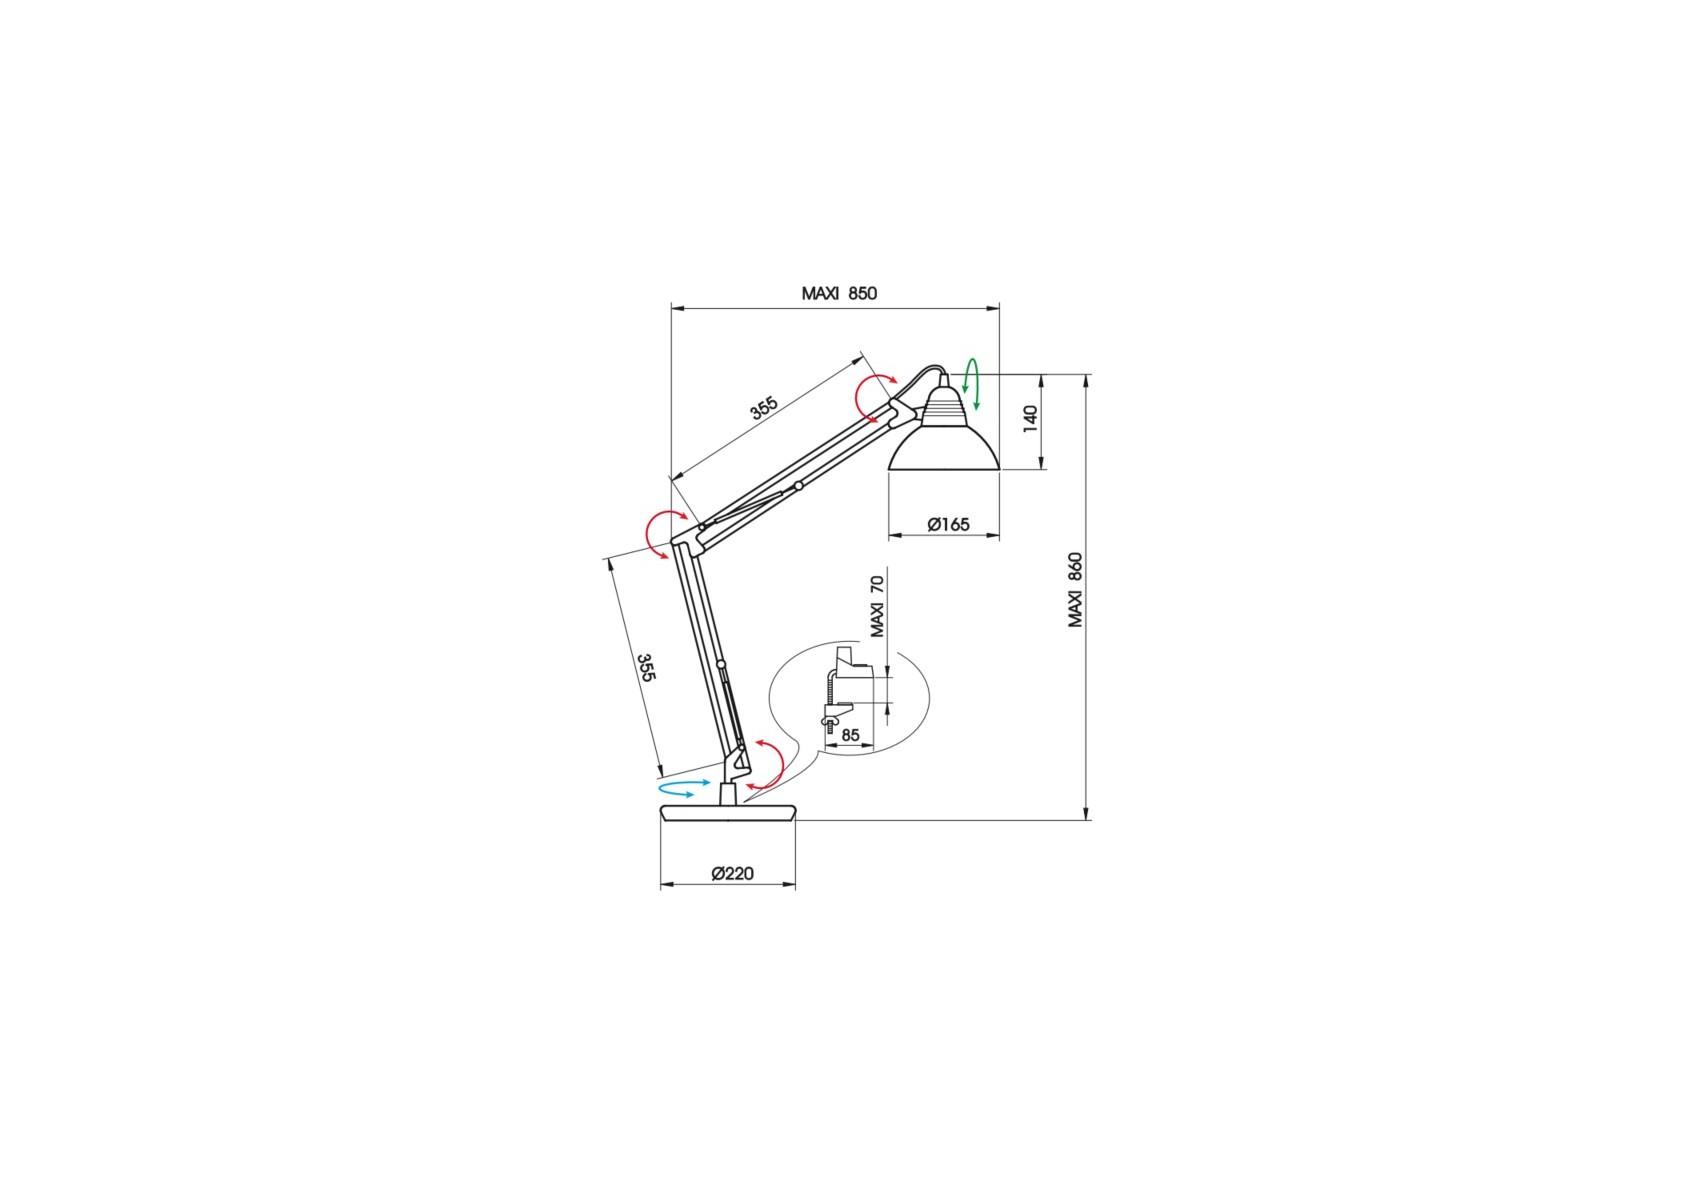 Grande Poser Ld95 Aluminor À Lampe Architecte Articulée rxsBtQhCd